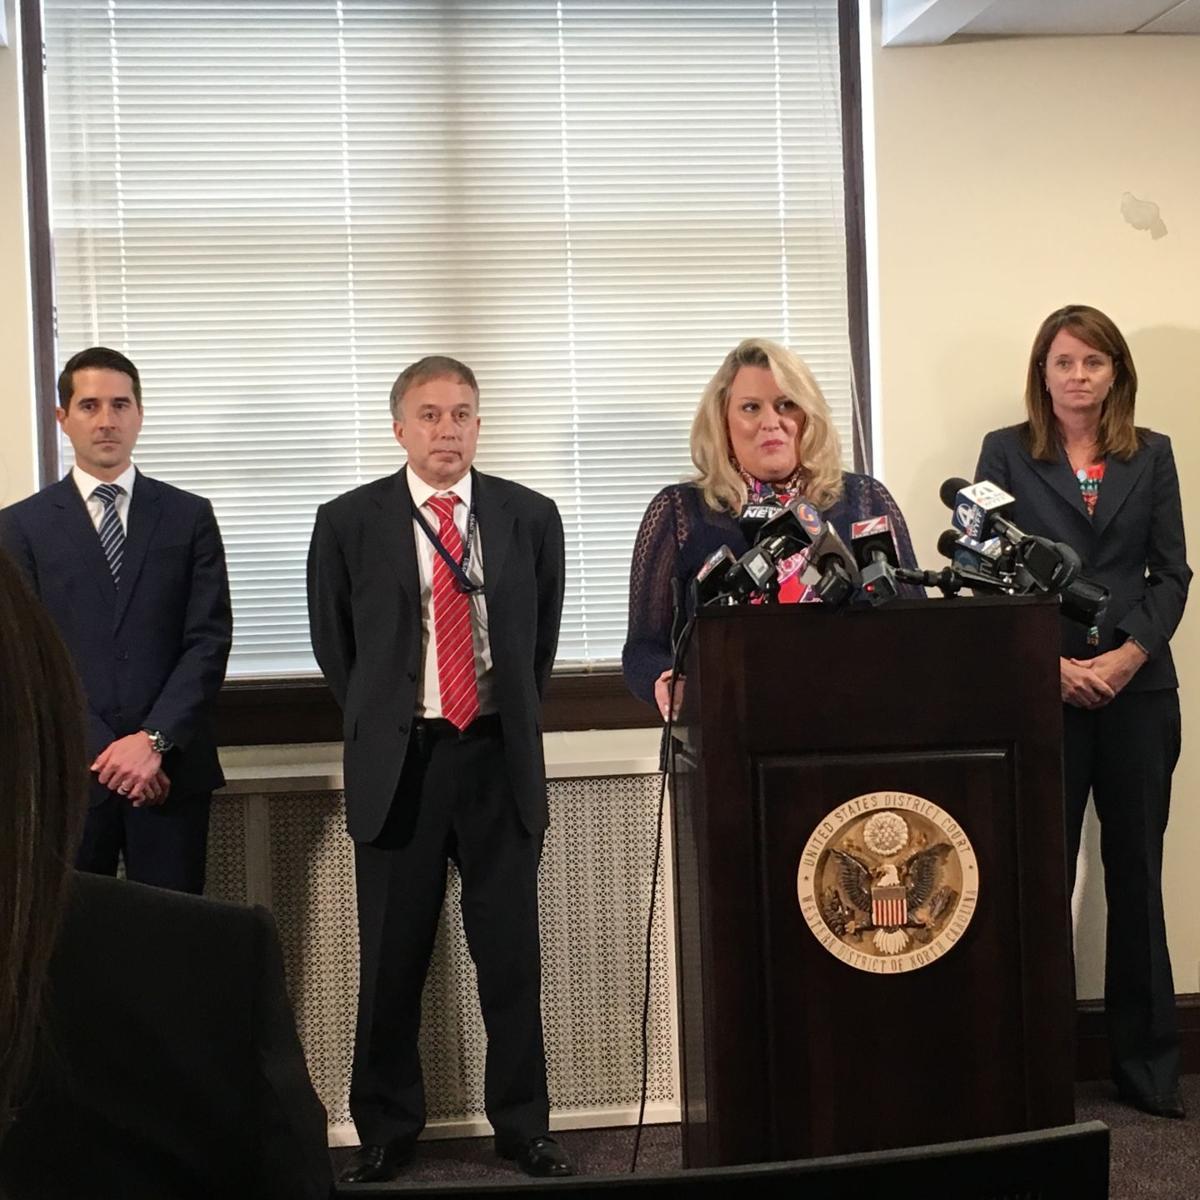 Justin Sullivan sentencing press conference